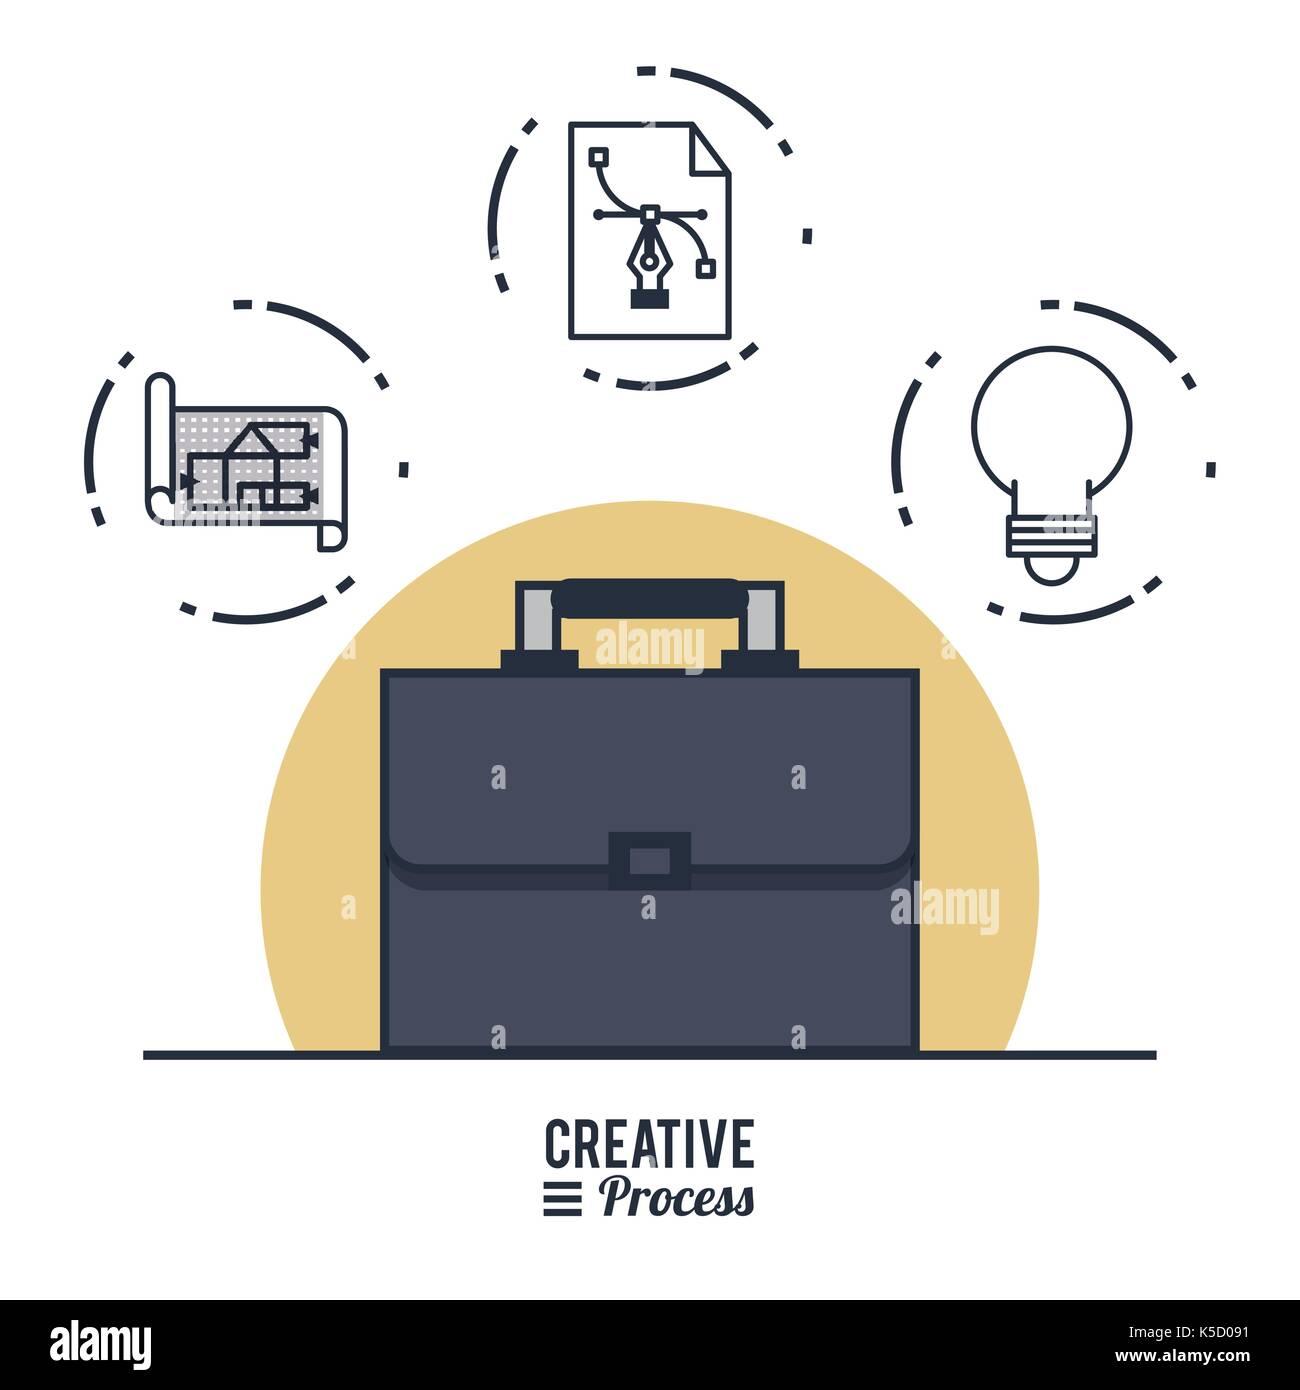 Creative process infographic Stock Vector Art & Illustration ...